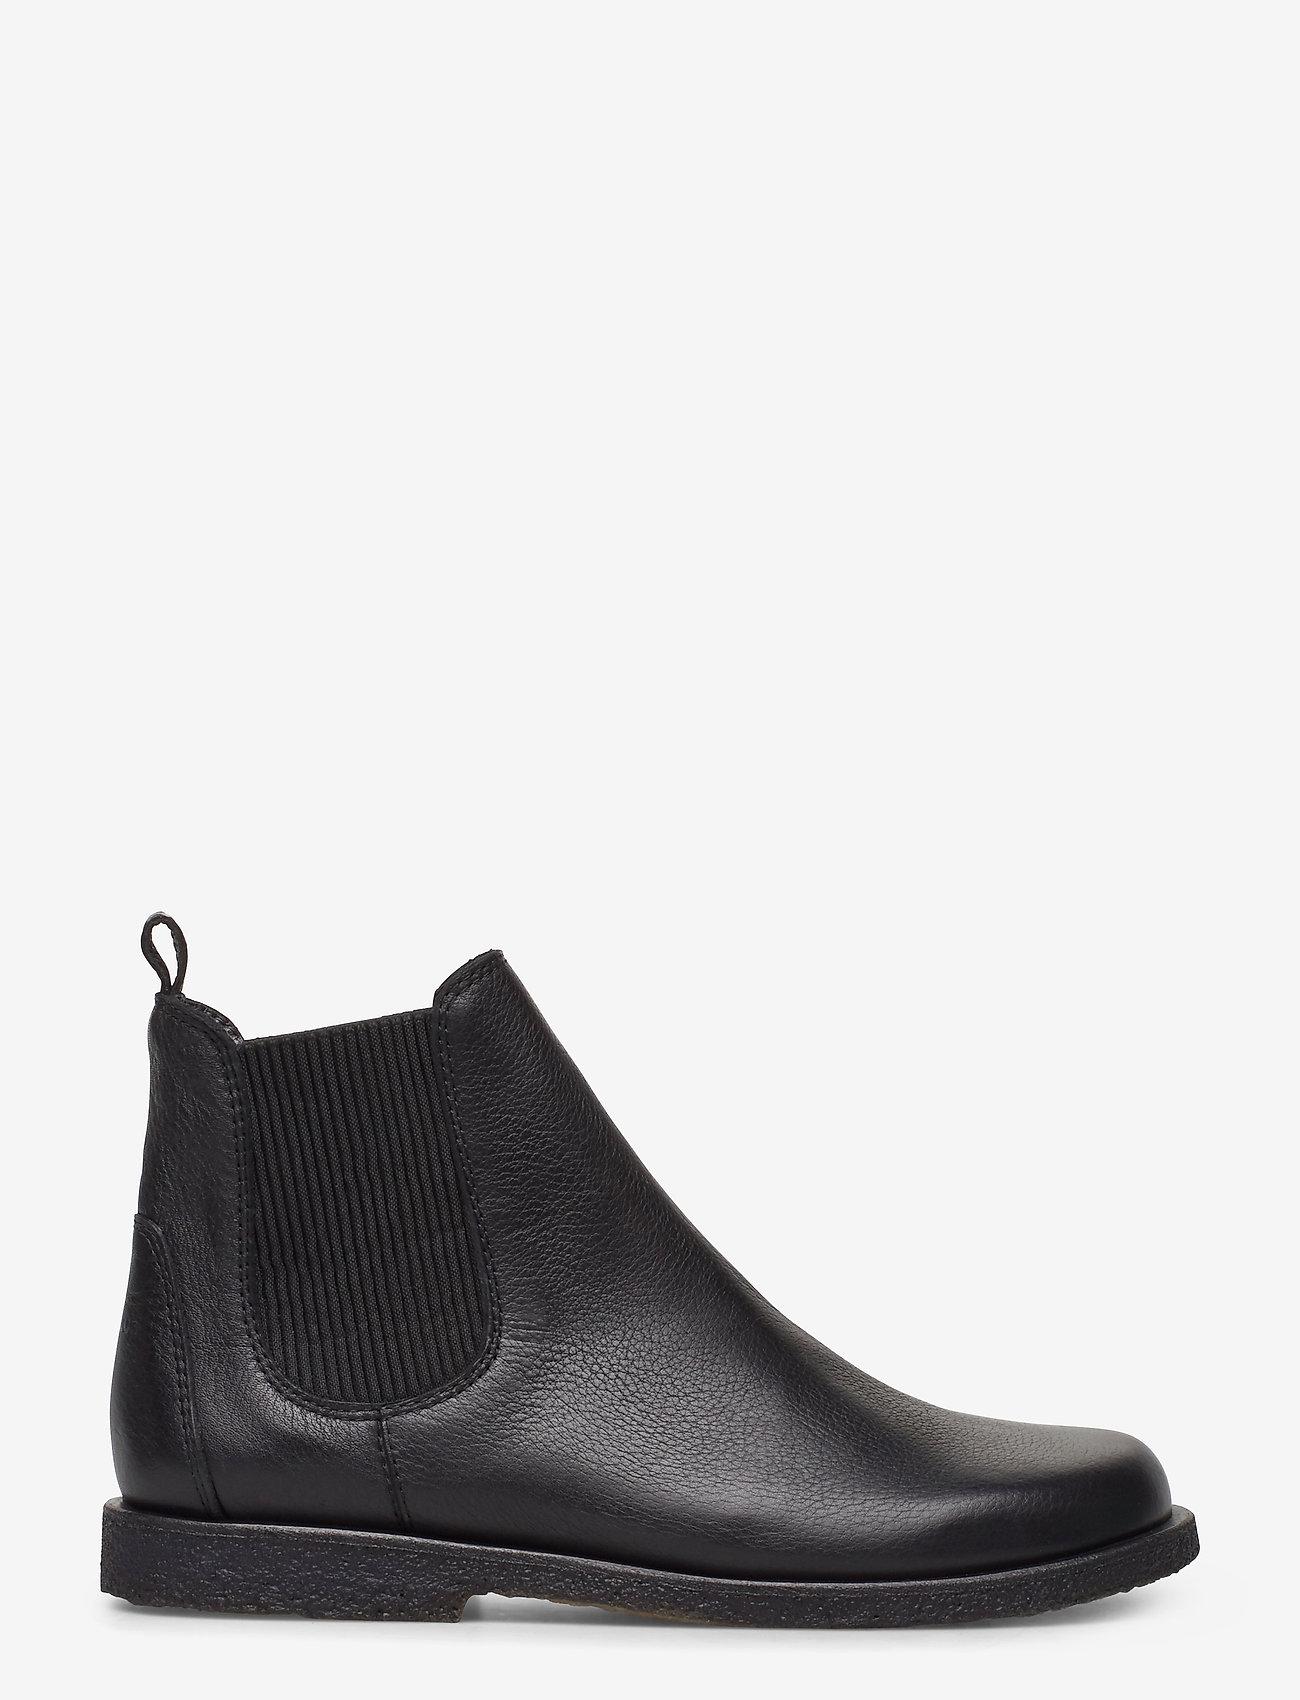 ANGULUS - Booties-flat - with elastic - chelsea støvler - 1933/019 black/black - 1